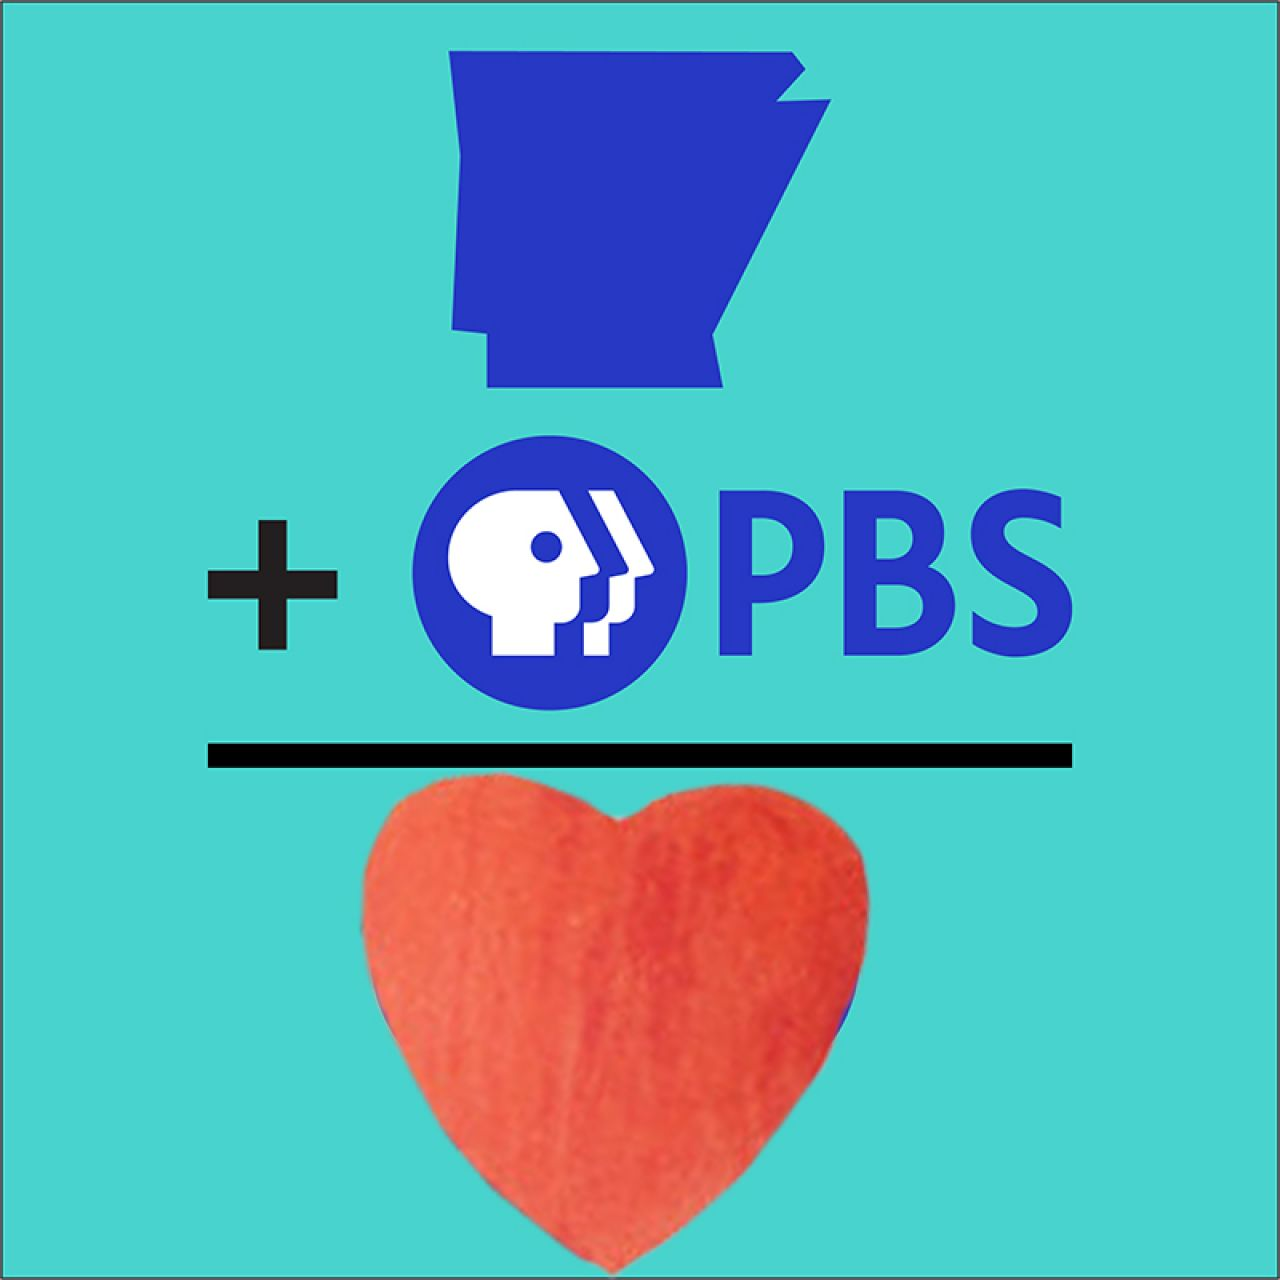 Arkansas + PBS = Love.